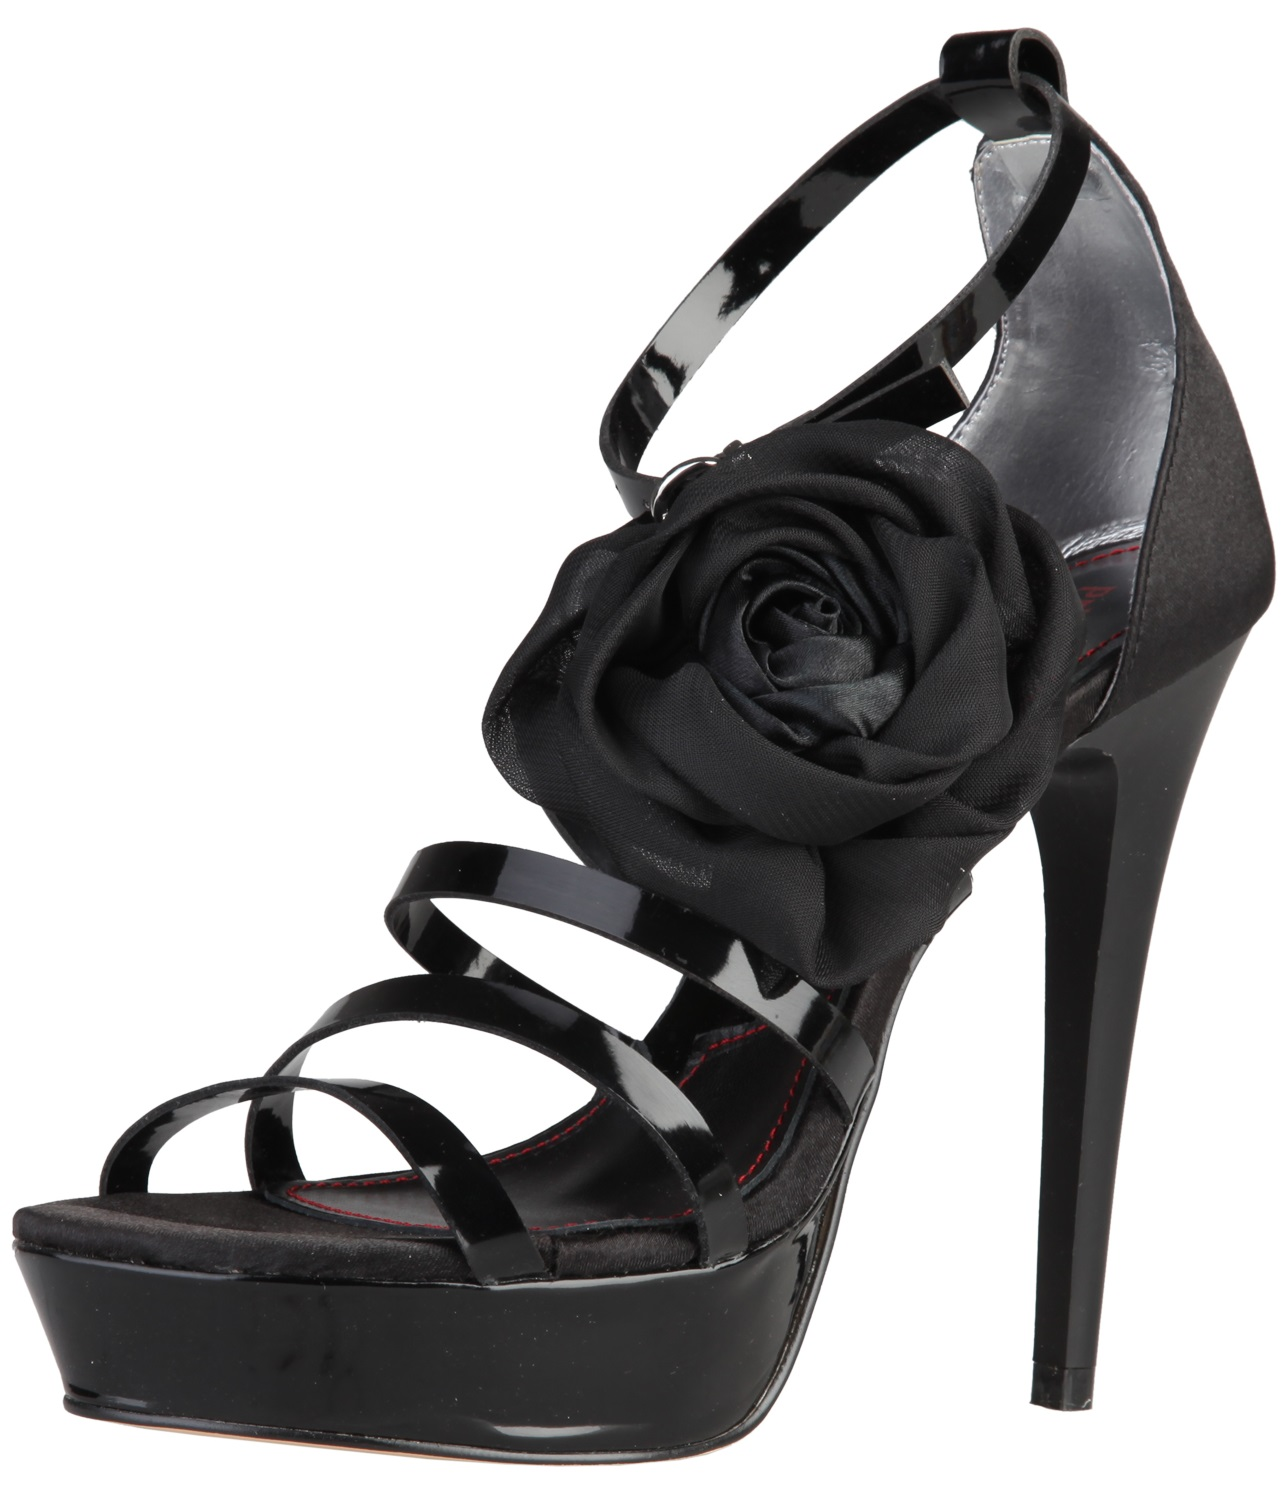 Primadona Sandals Nero Rf600106